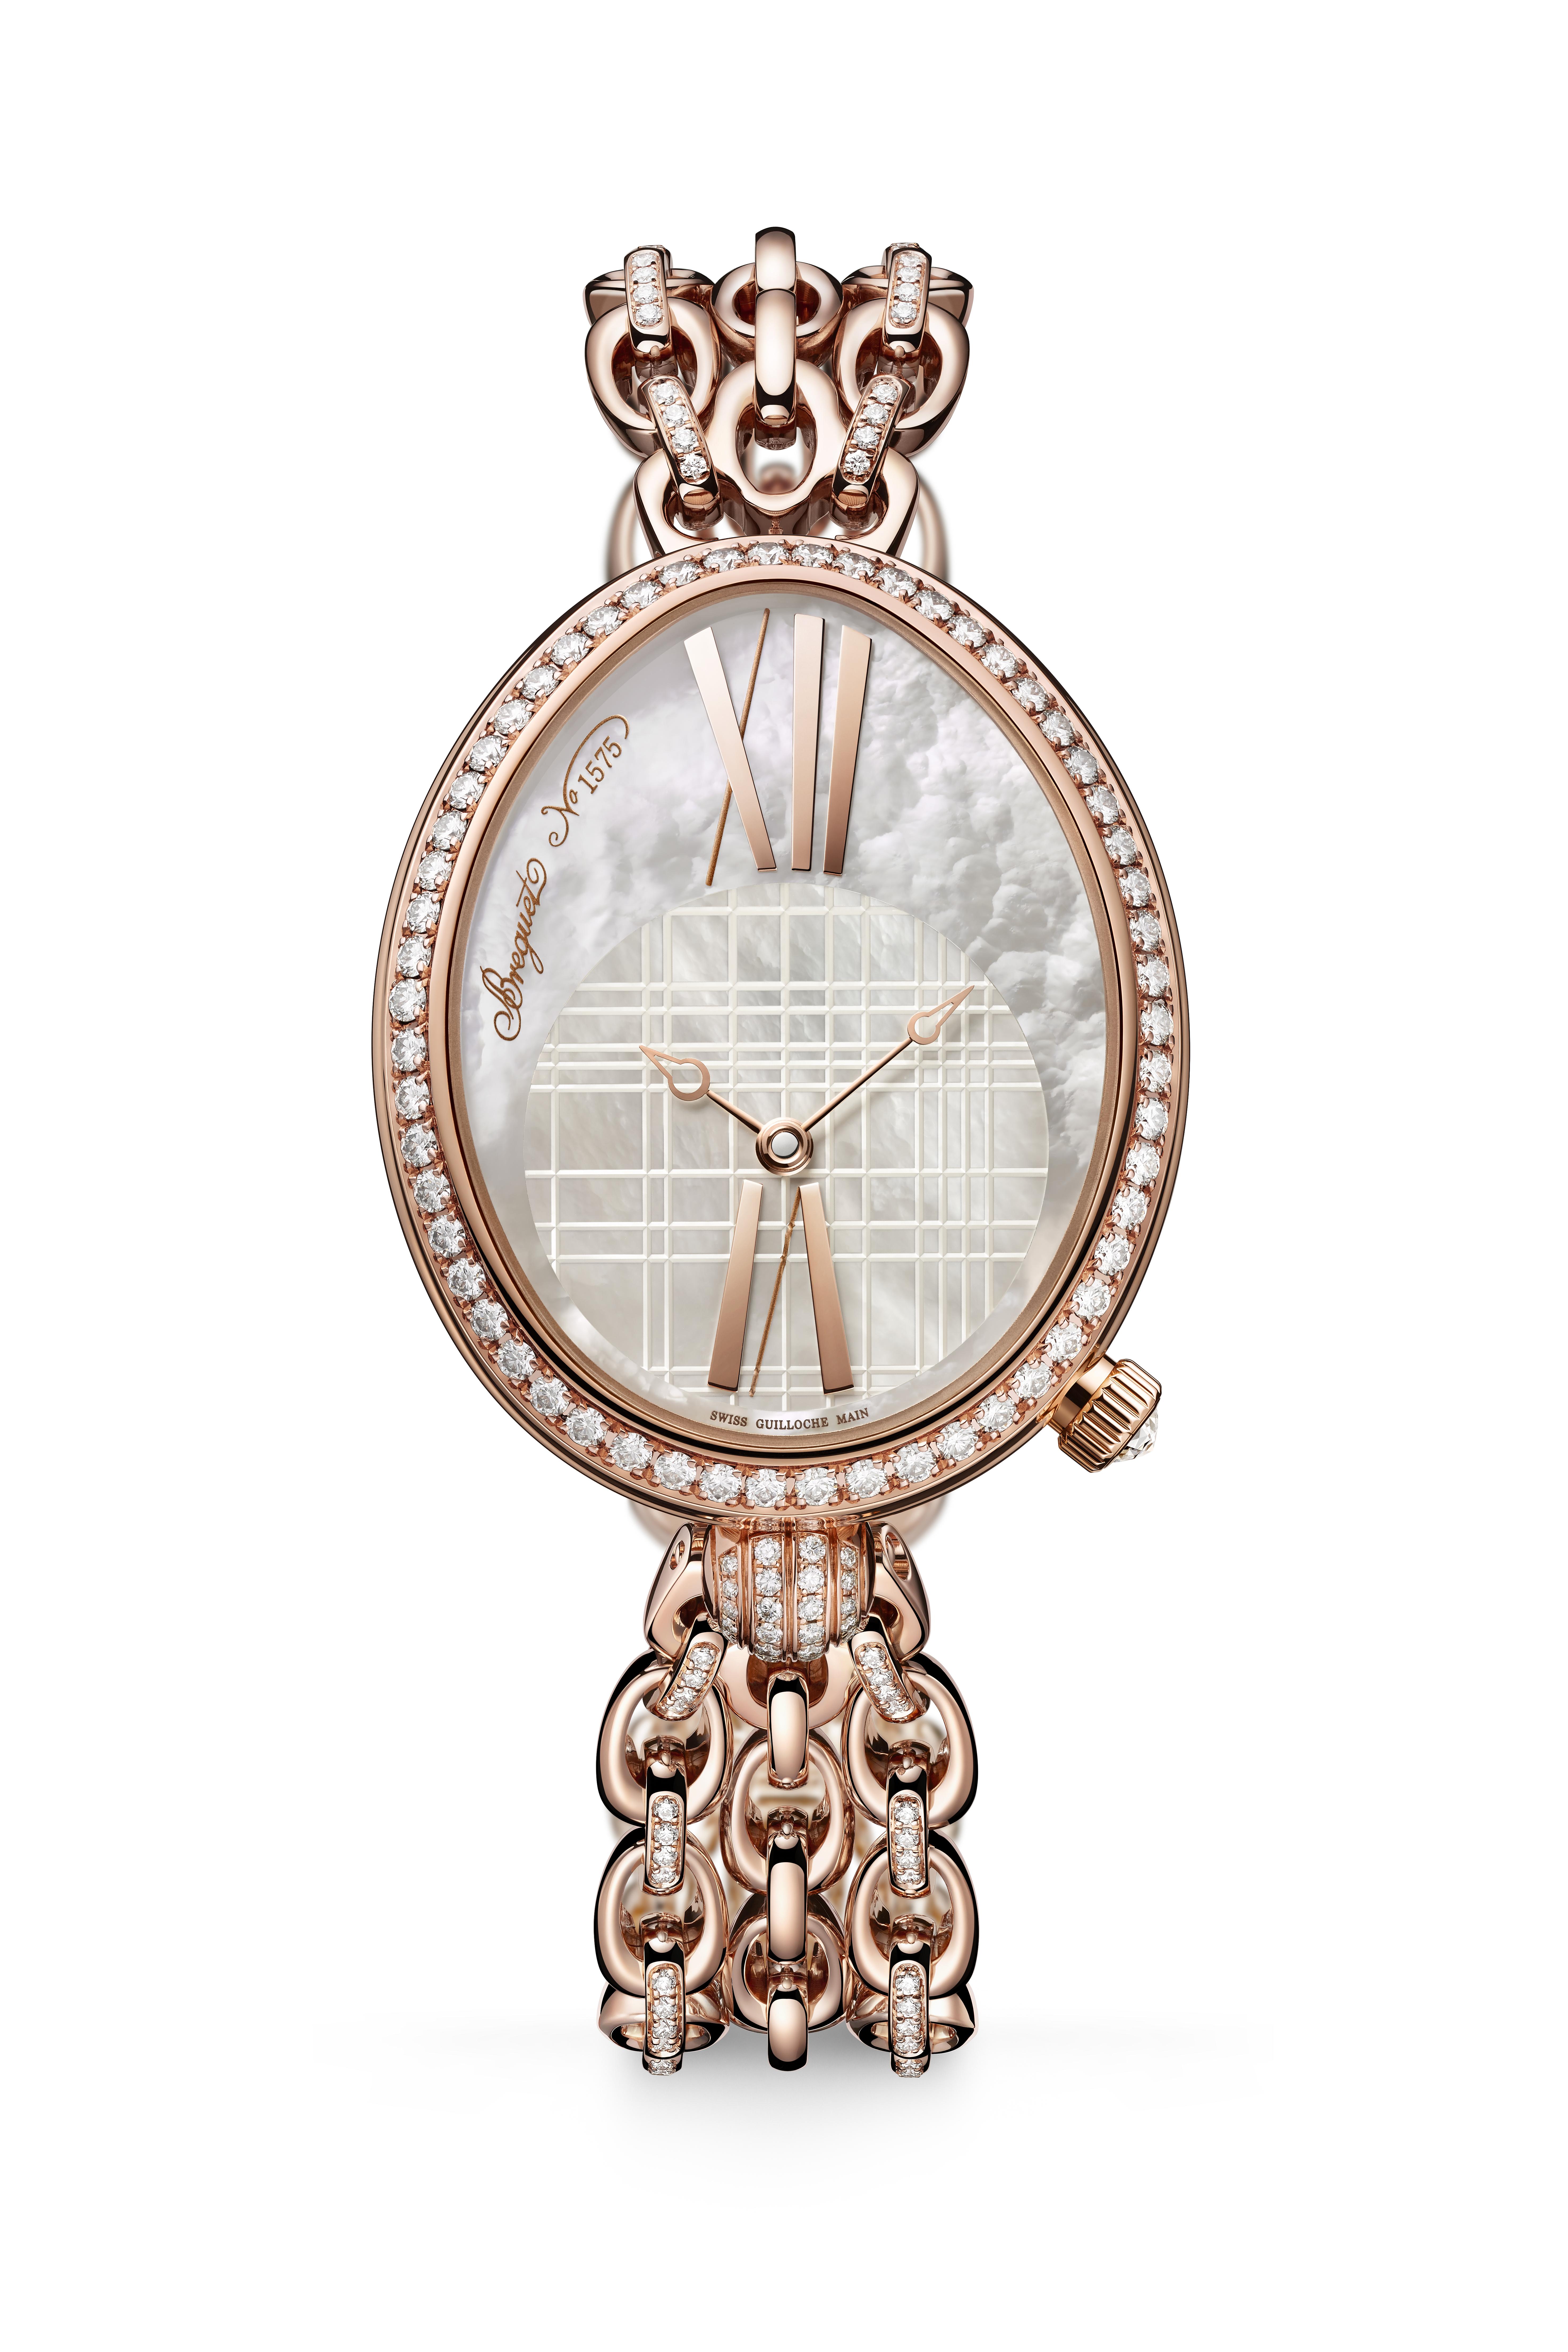 ساعة بريغيه Breguet